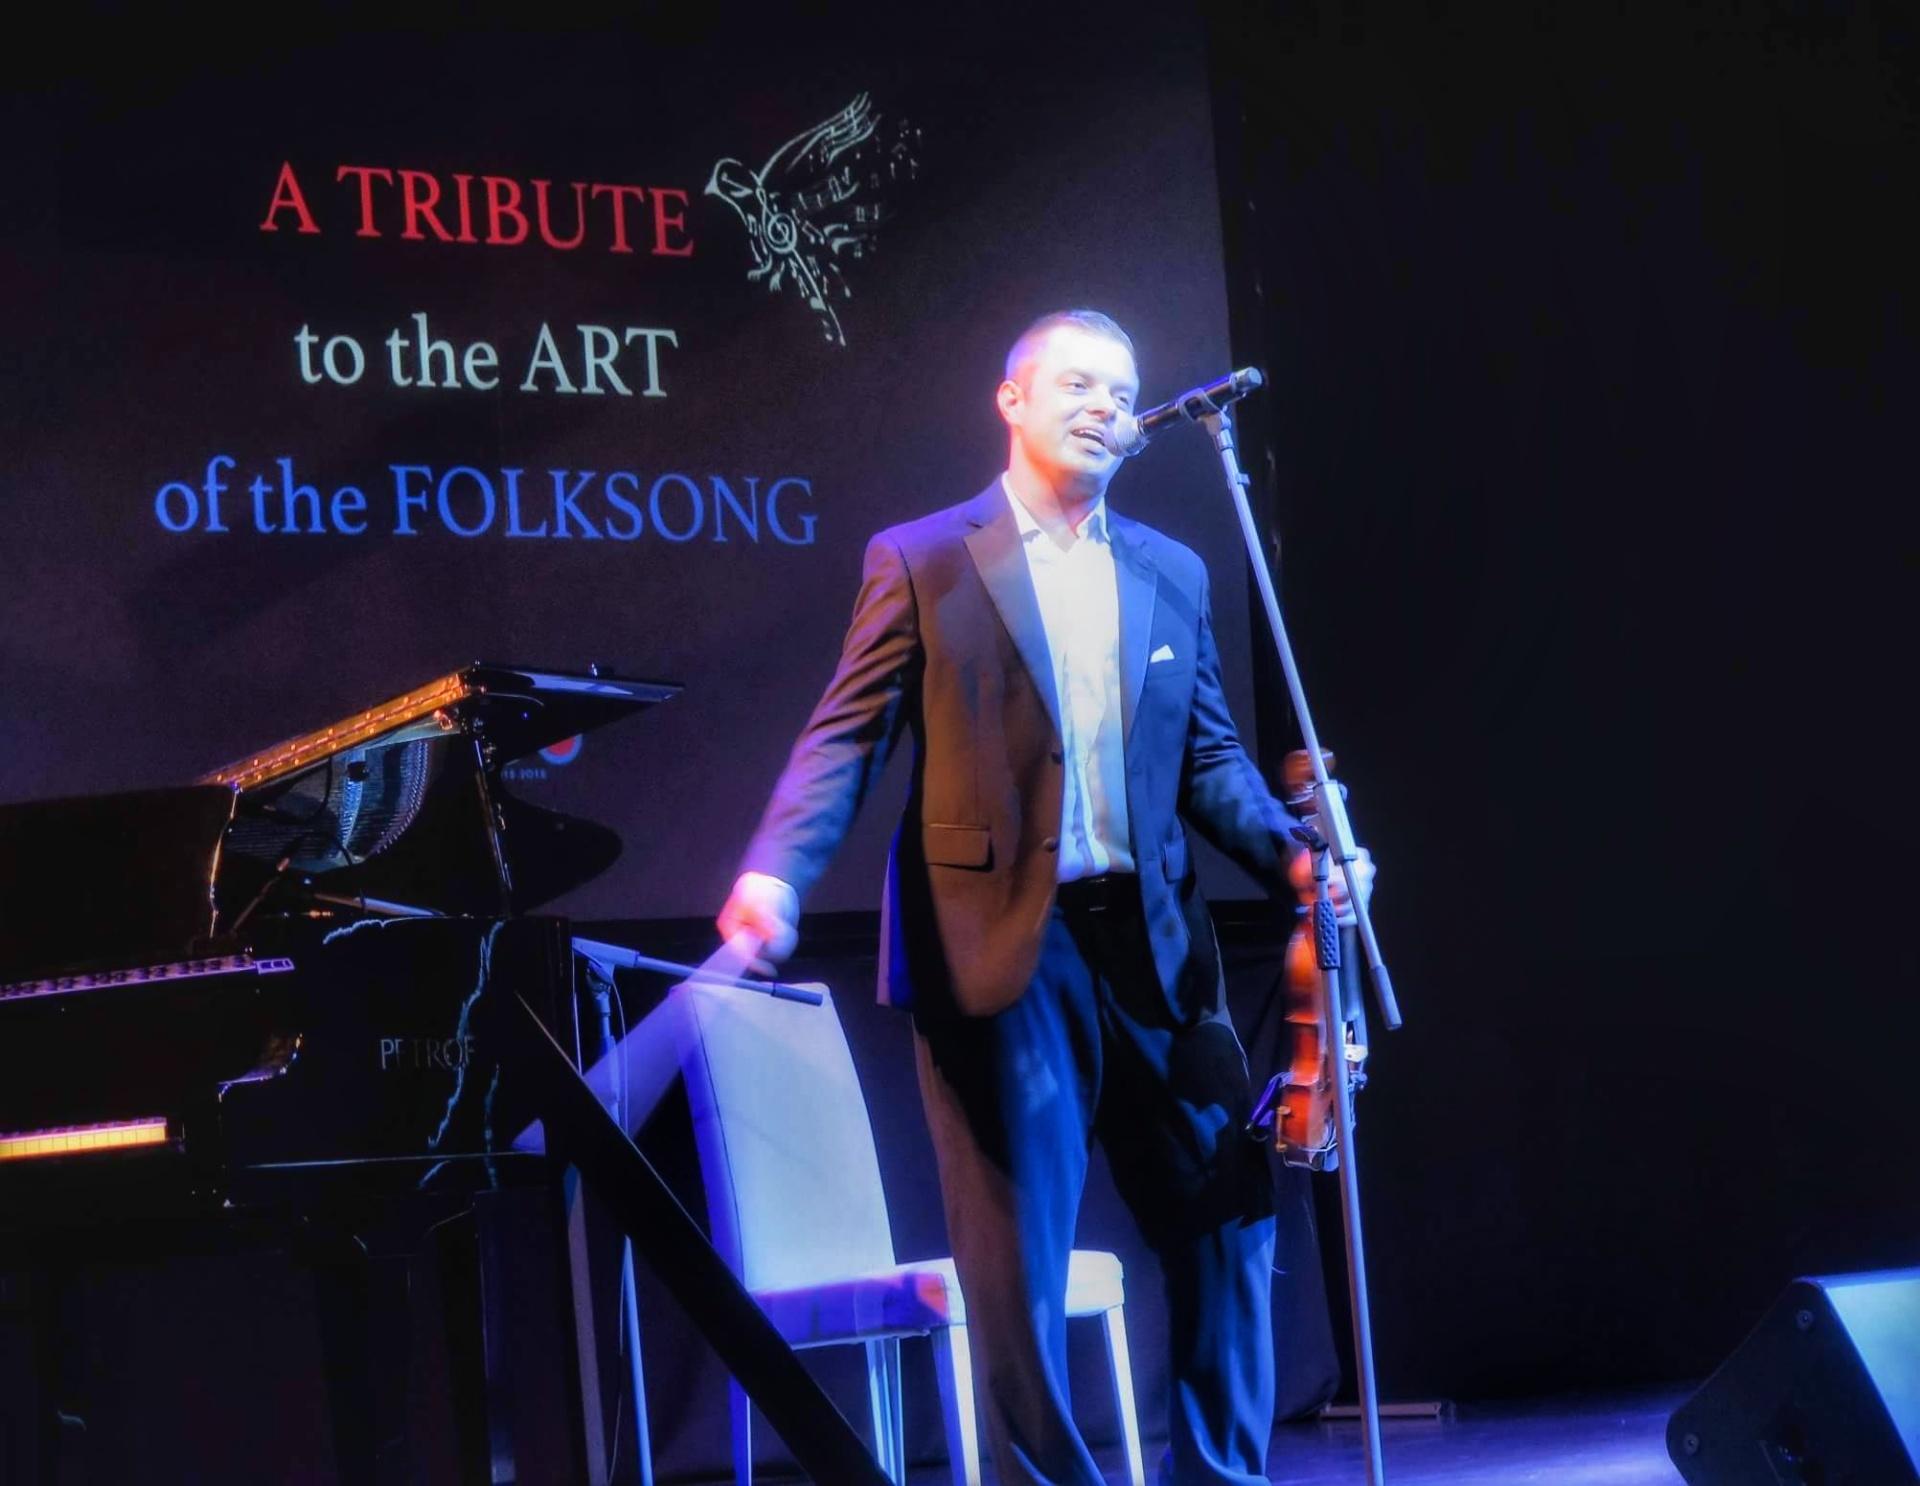 Centennial Heritage Festival - Celebrating Folk Arts